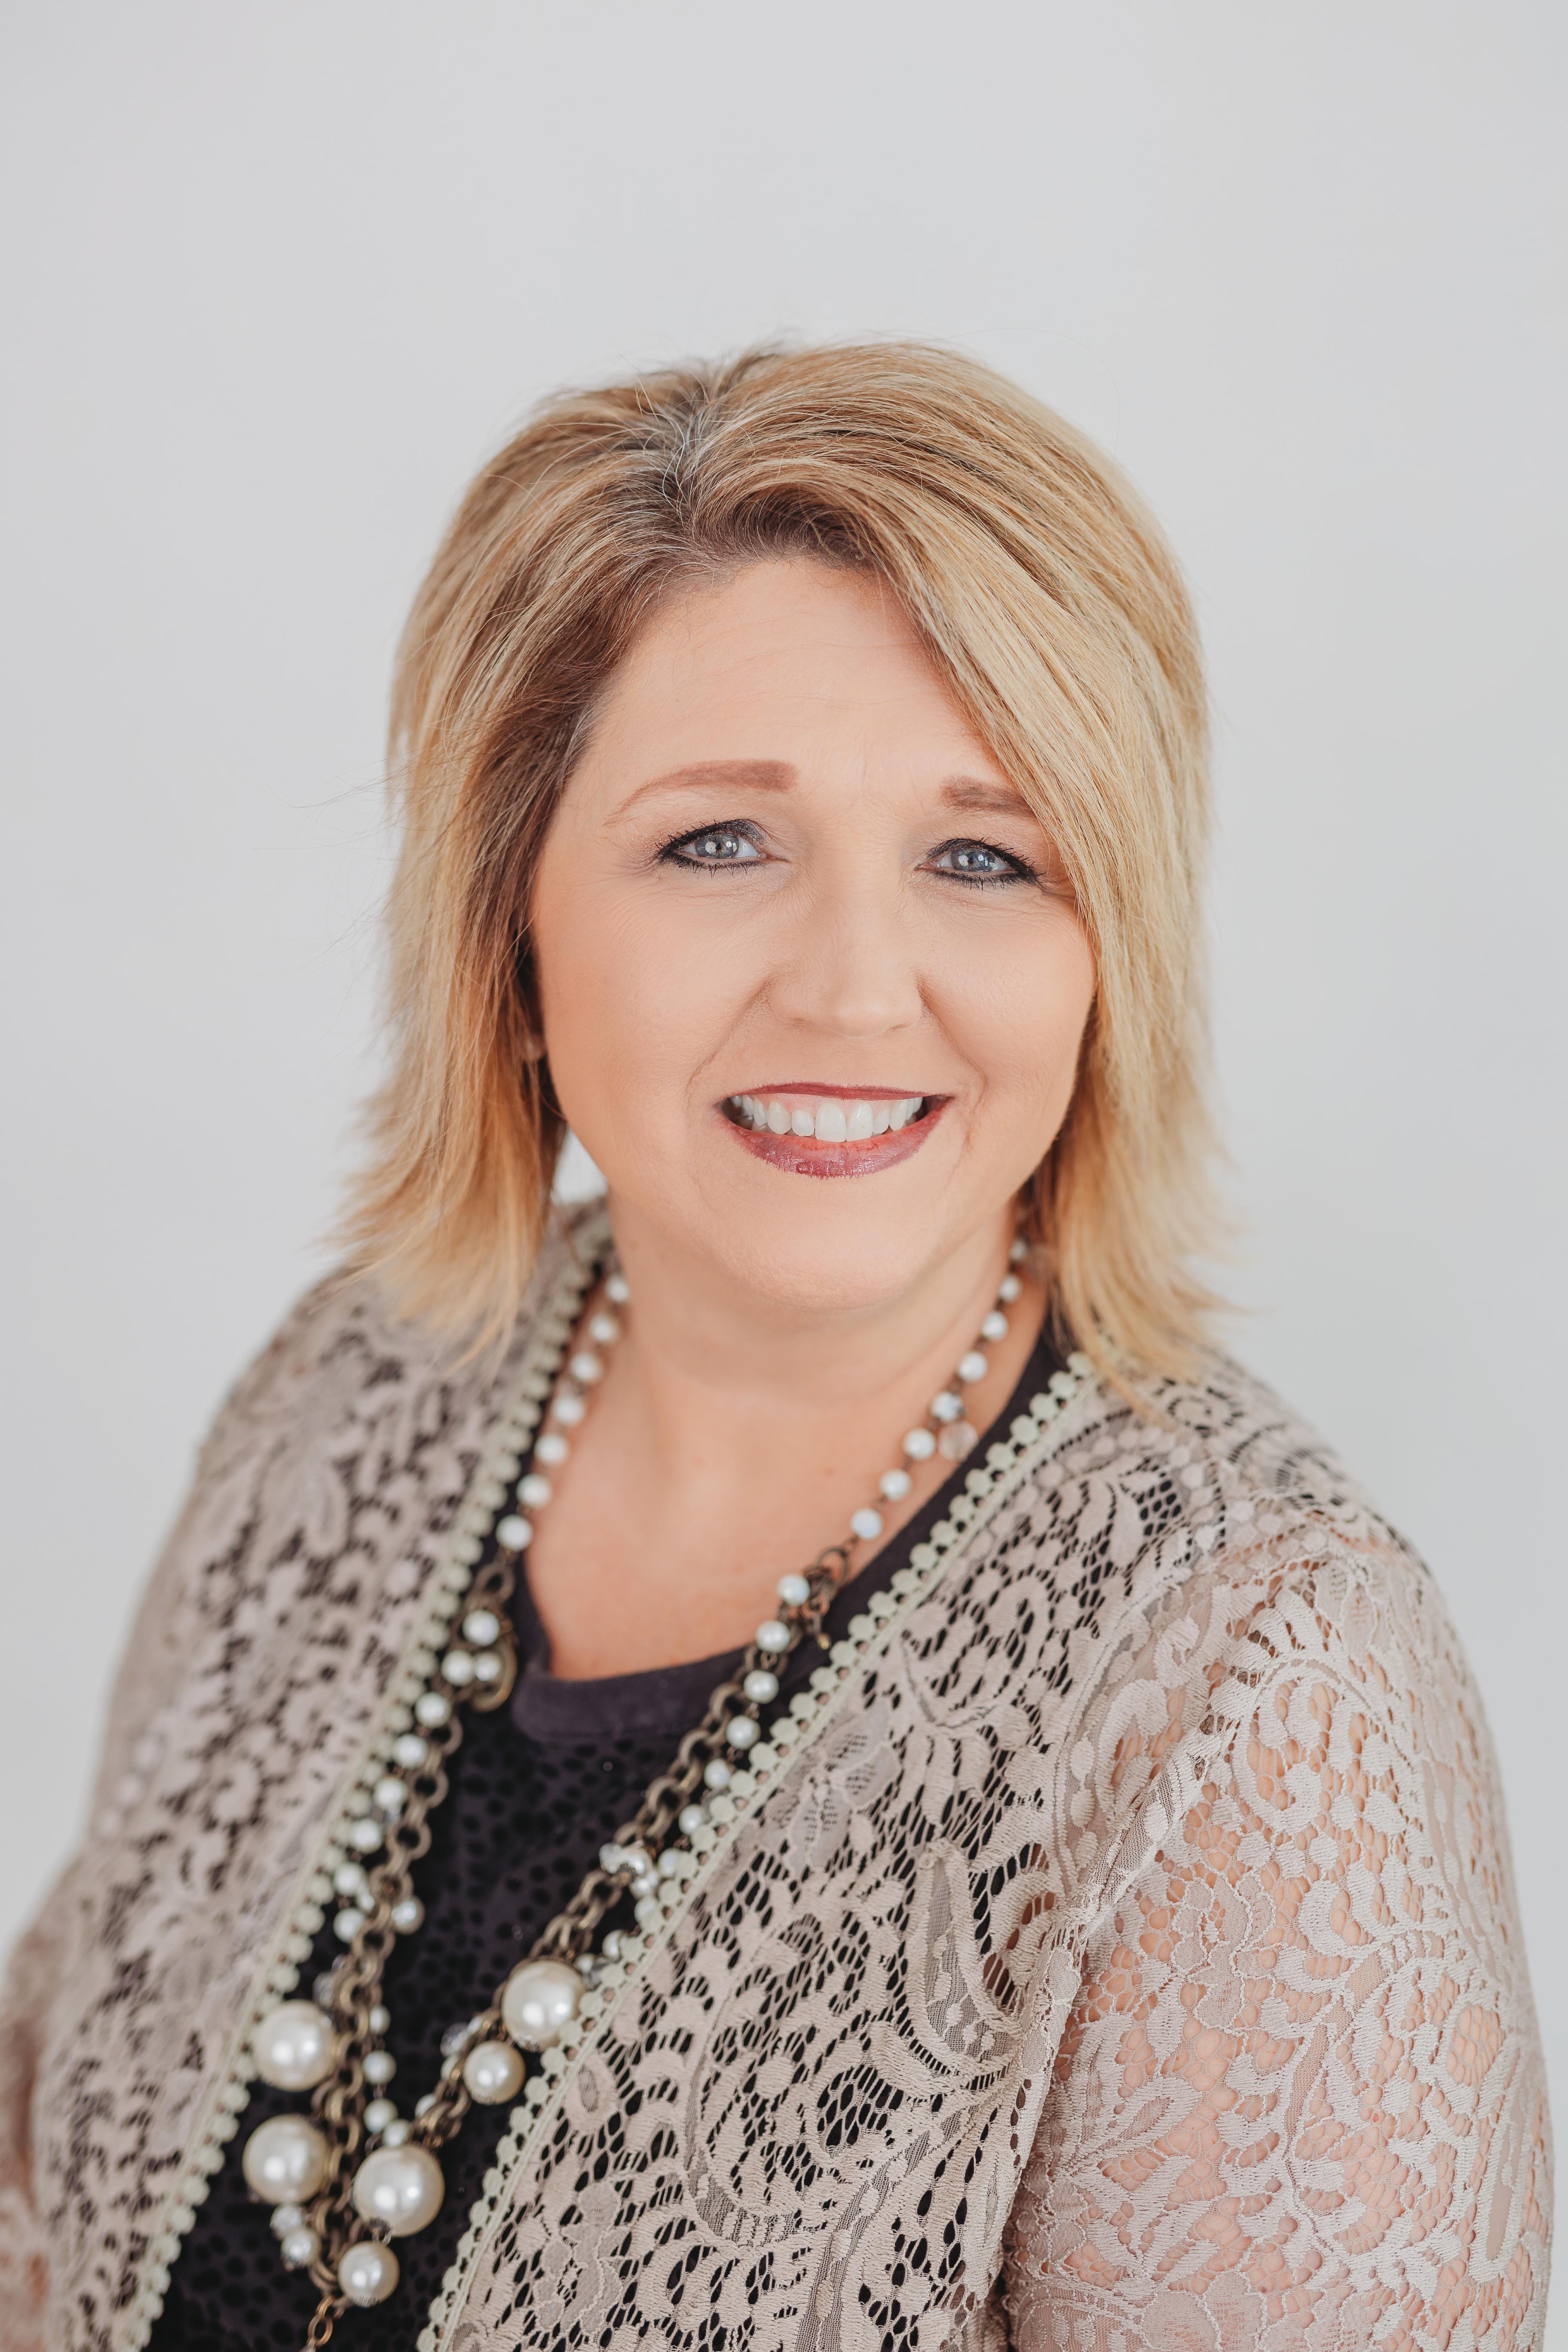 Tonyia Rank   Health and Life Insurance Agent   Fort Smith, AR 72916